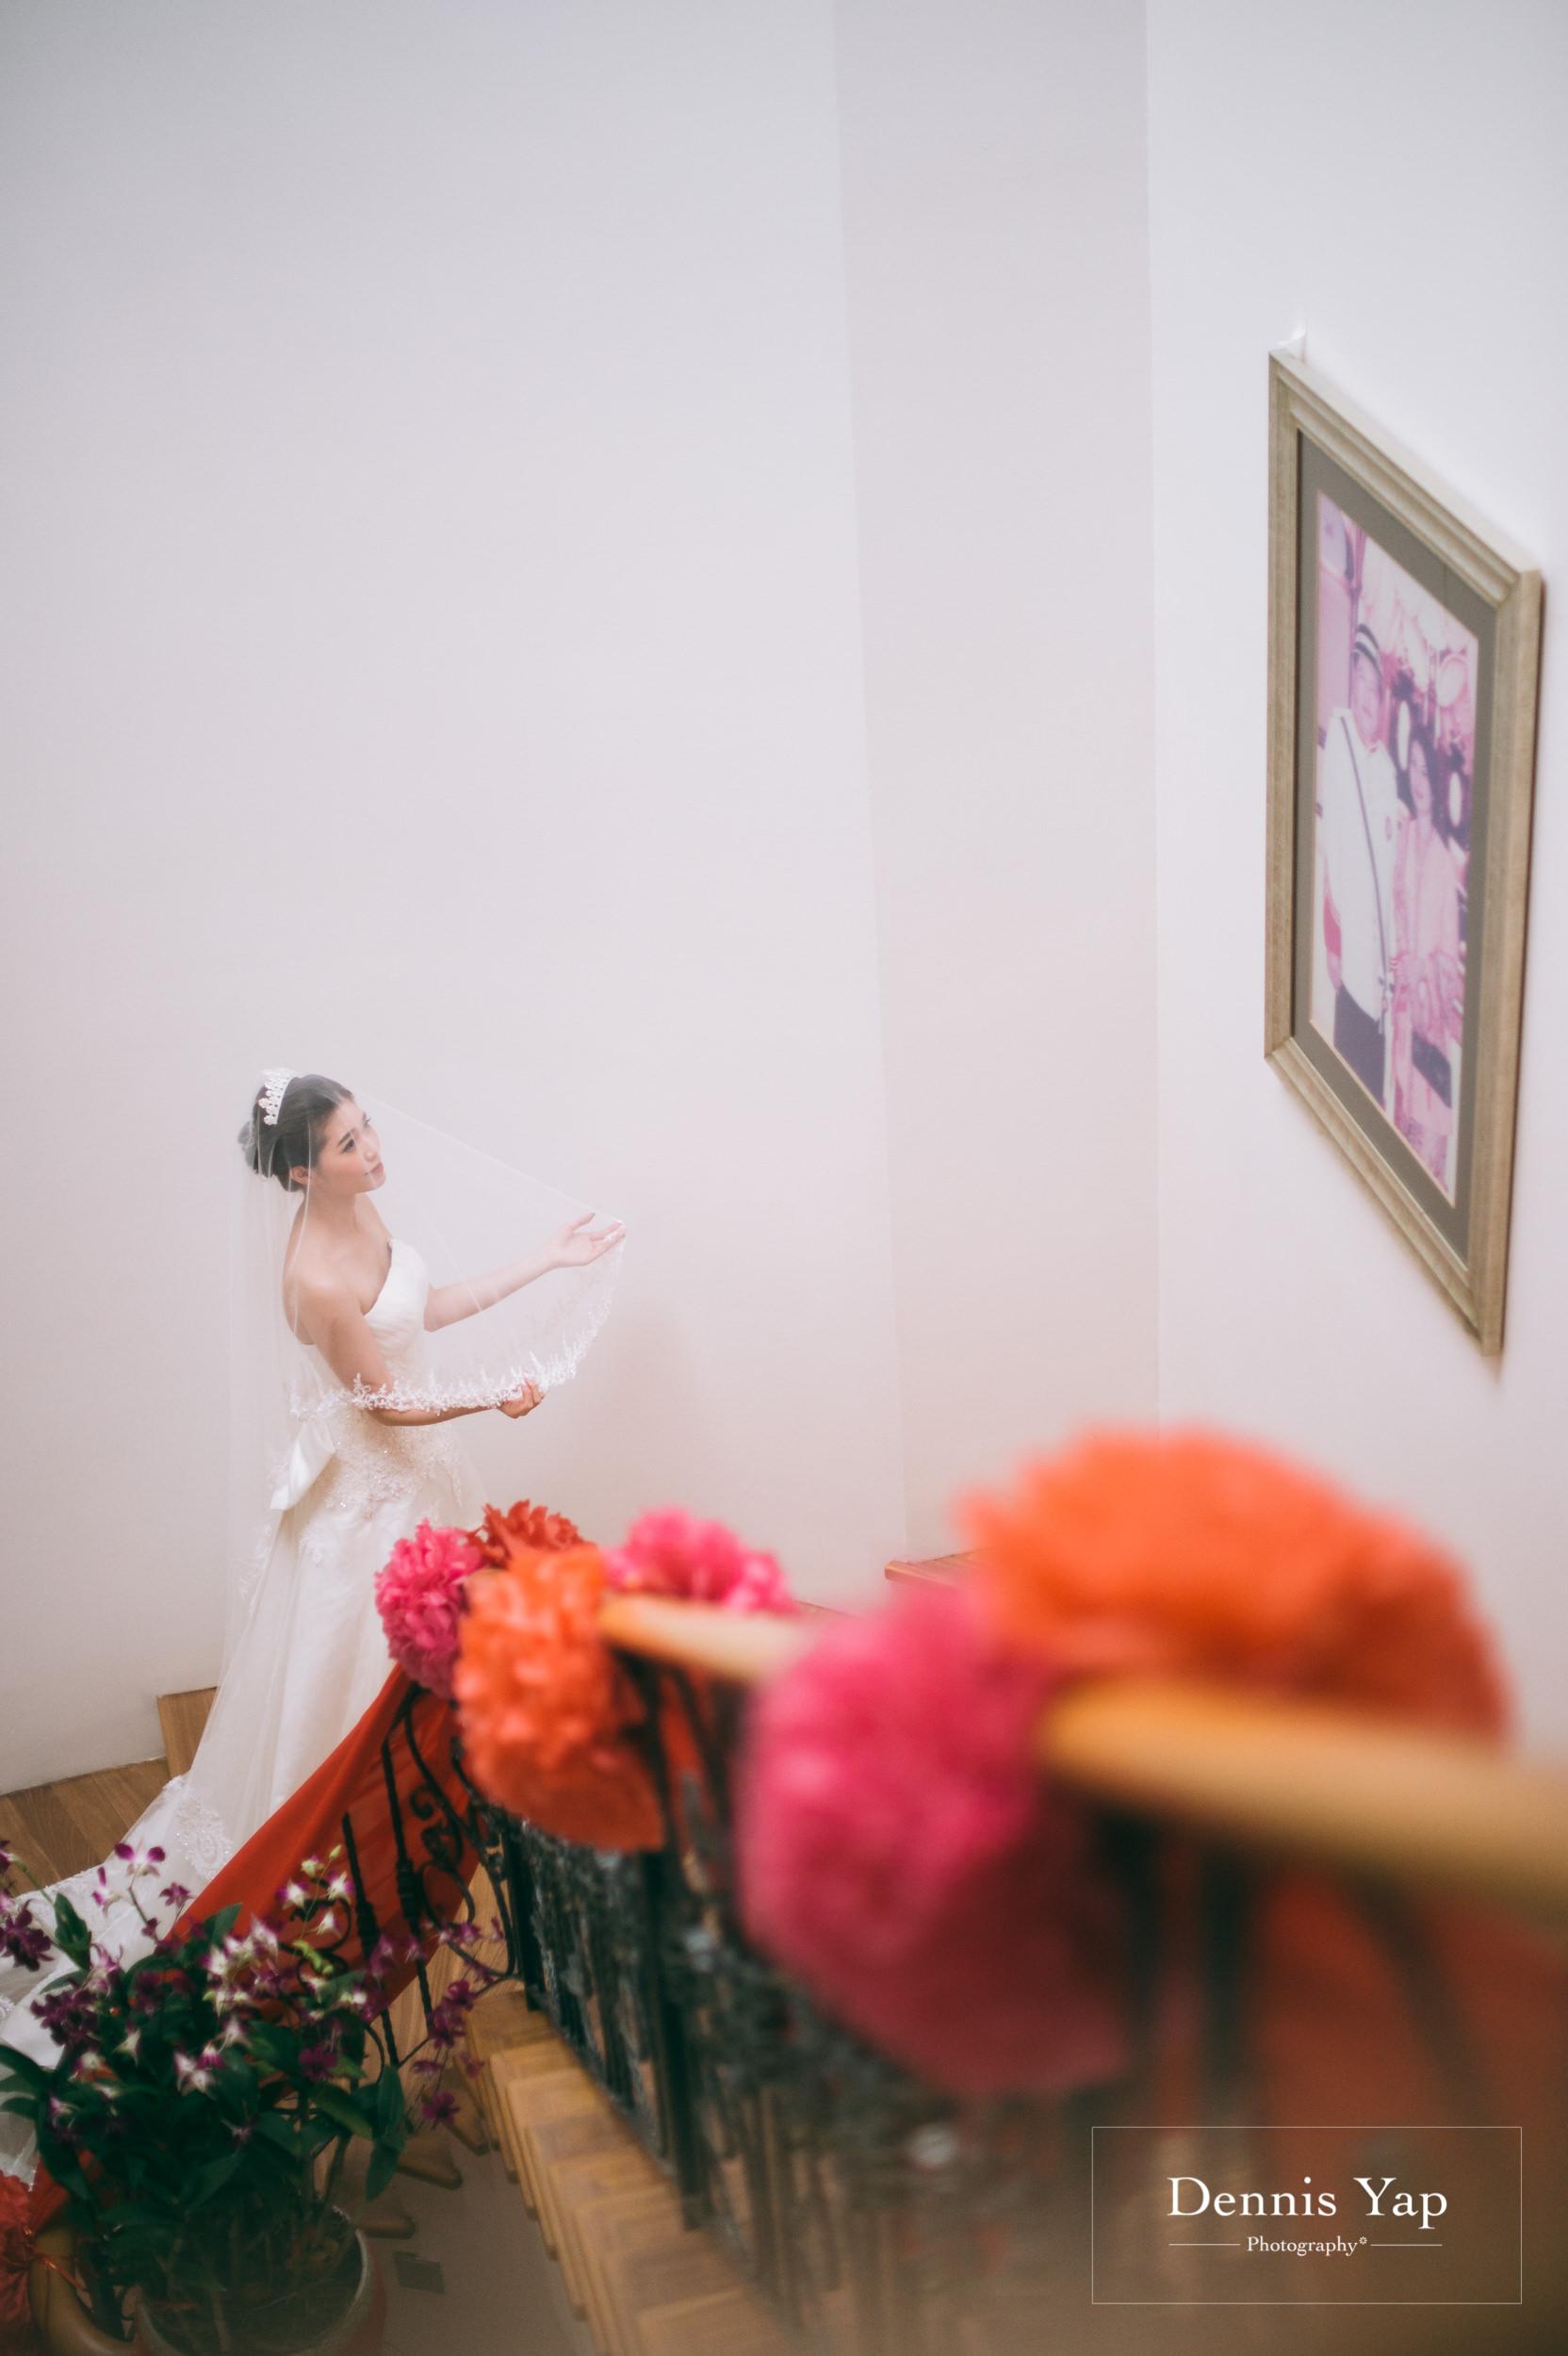 ivan constance wedding day renaissance hotel dennis yap photography-9.jpg